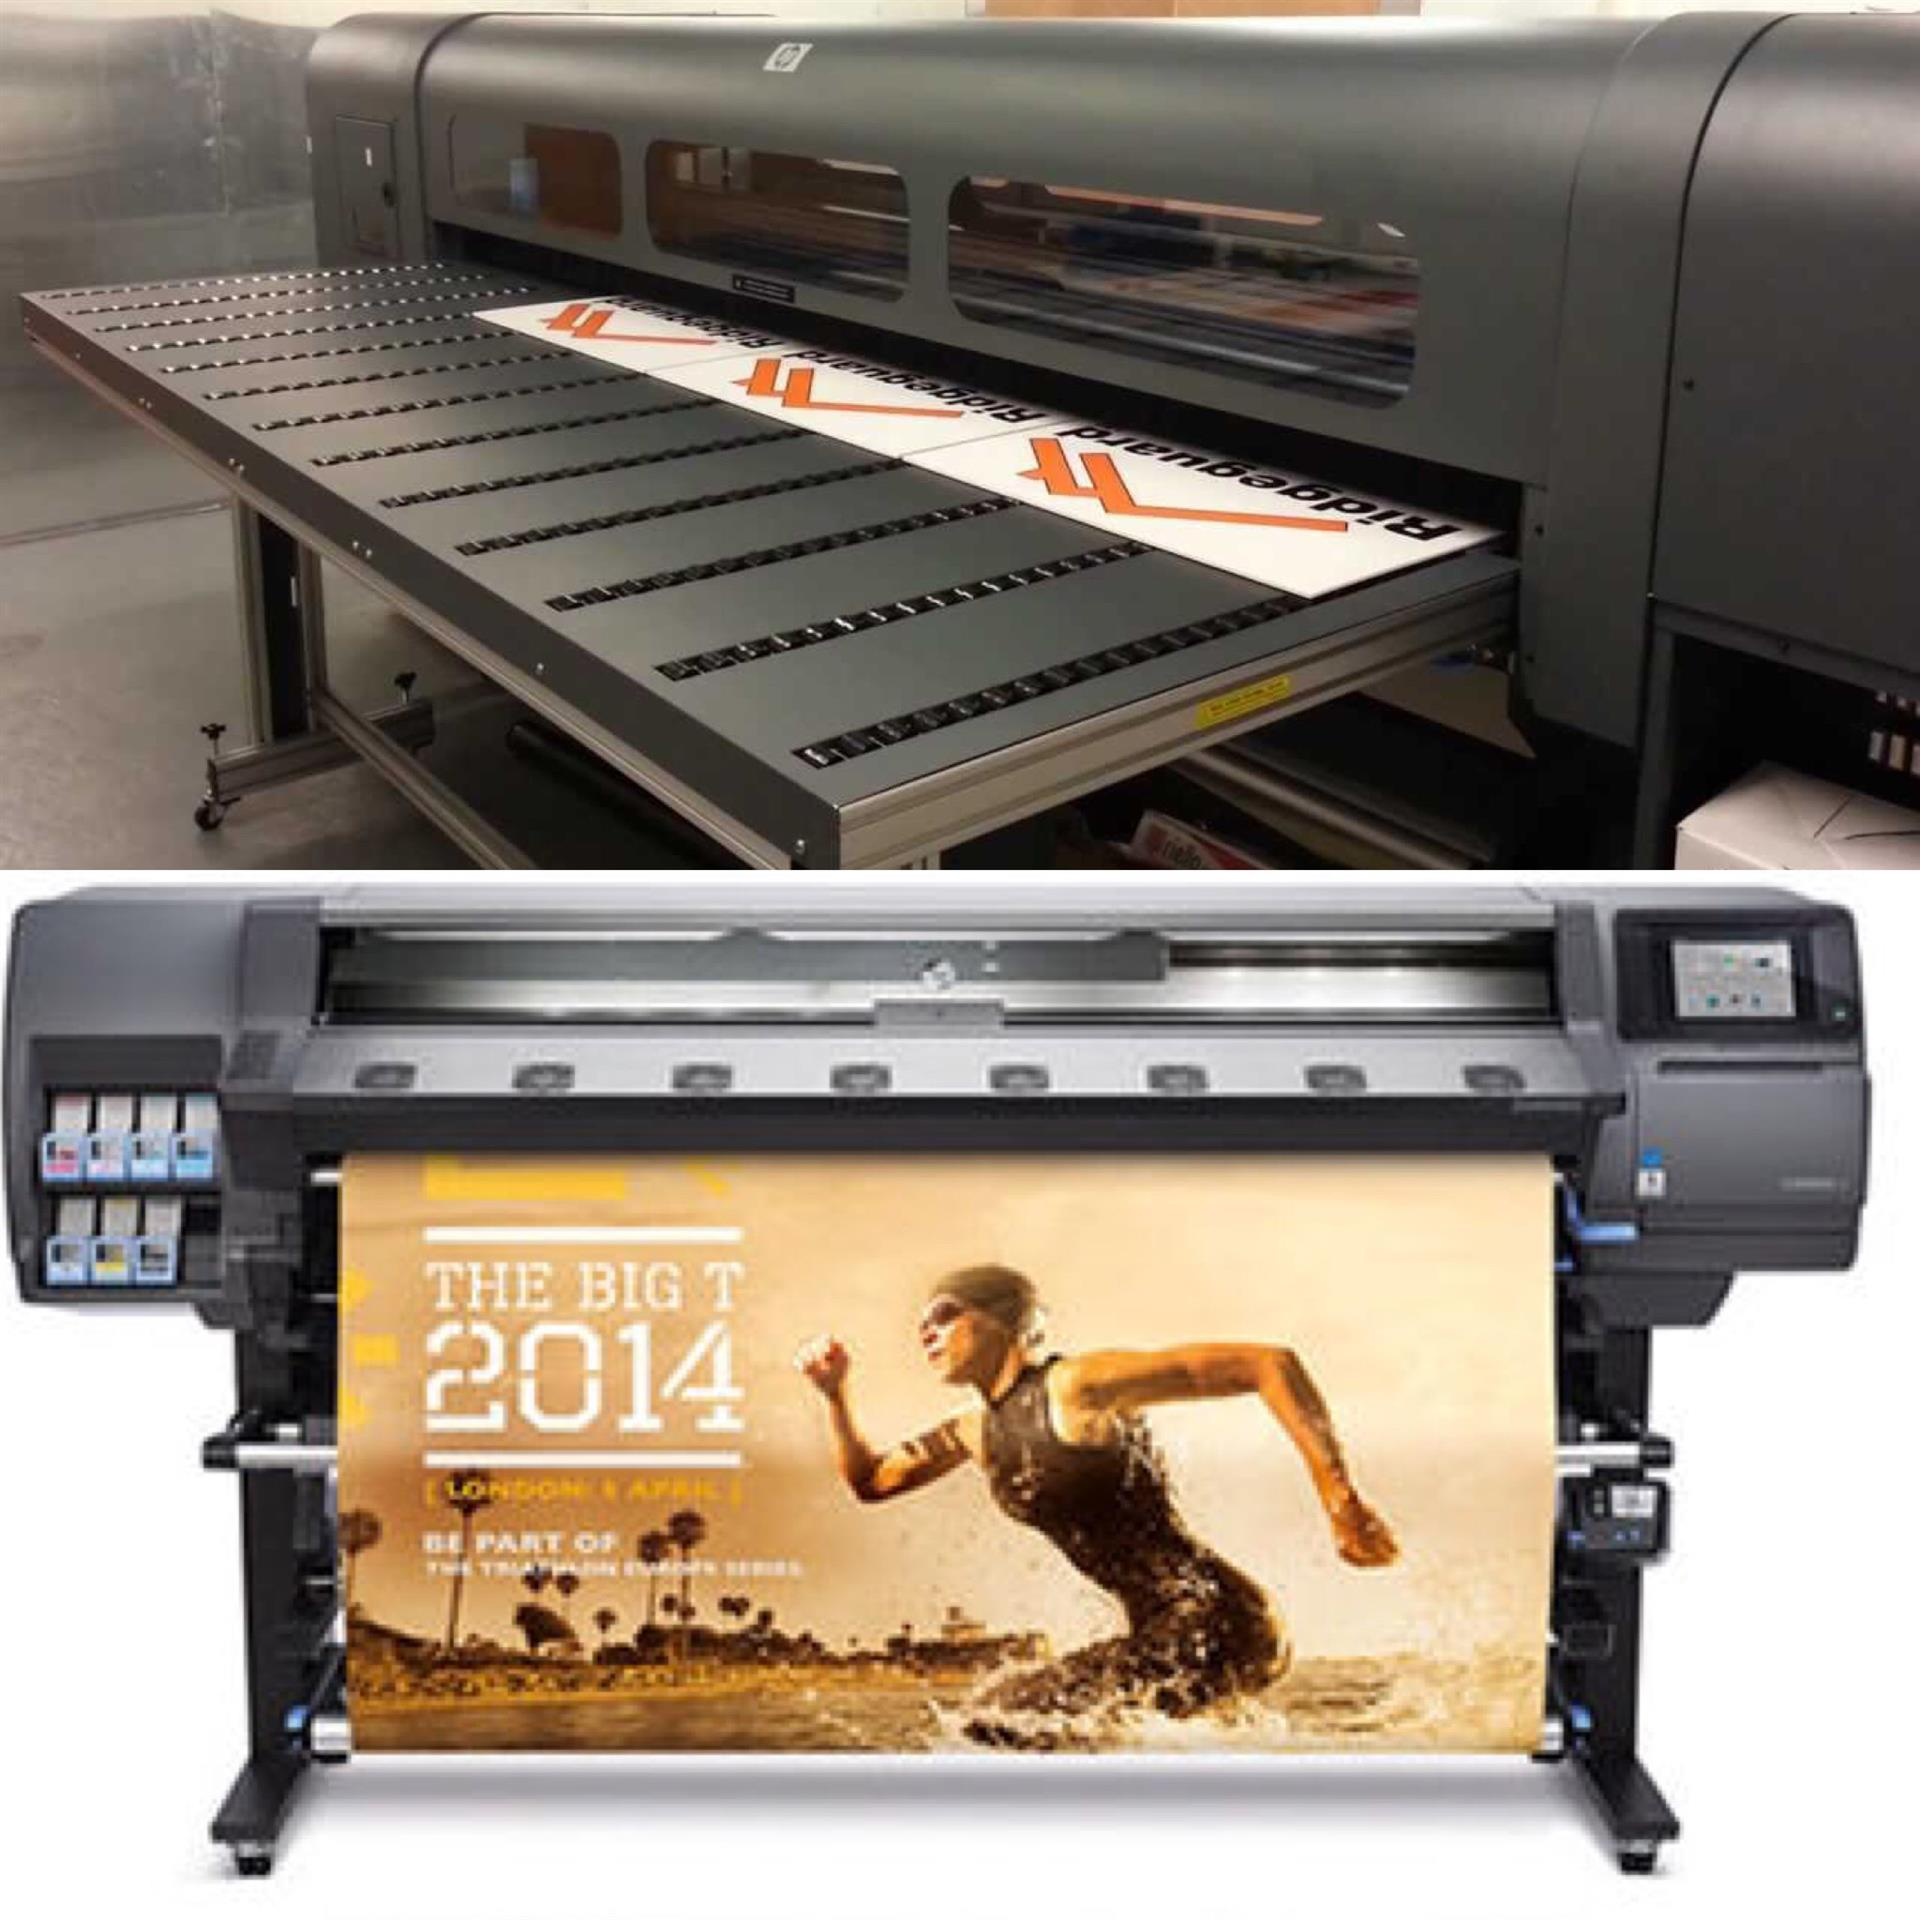 Printing 101: Flat Bed Printing vs. Wide Format Roll Printers